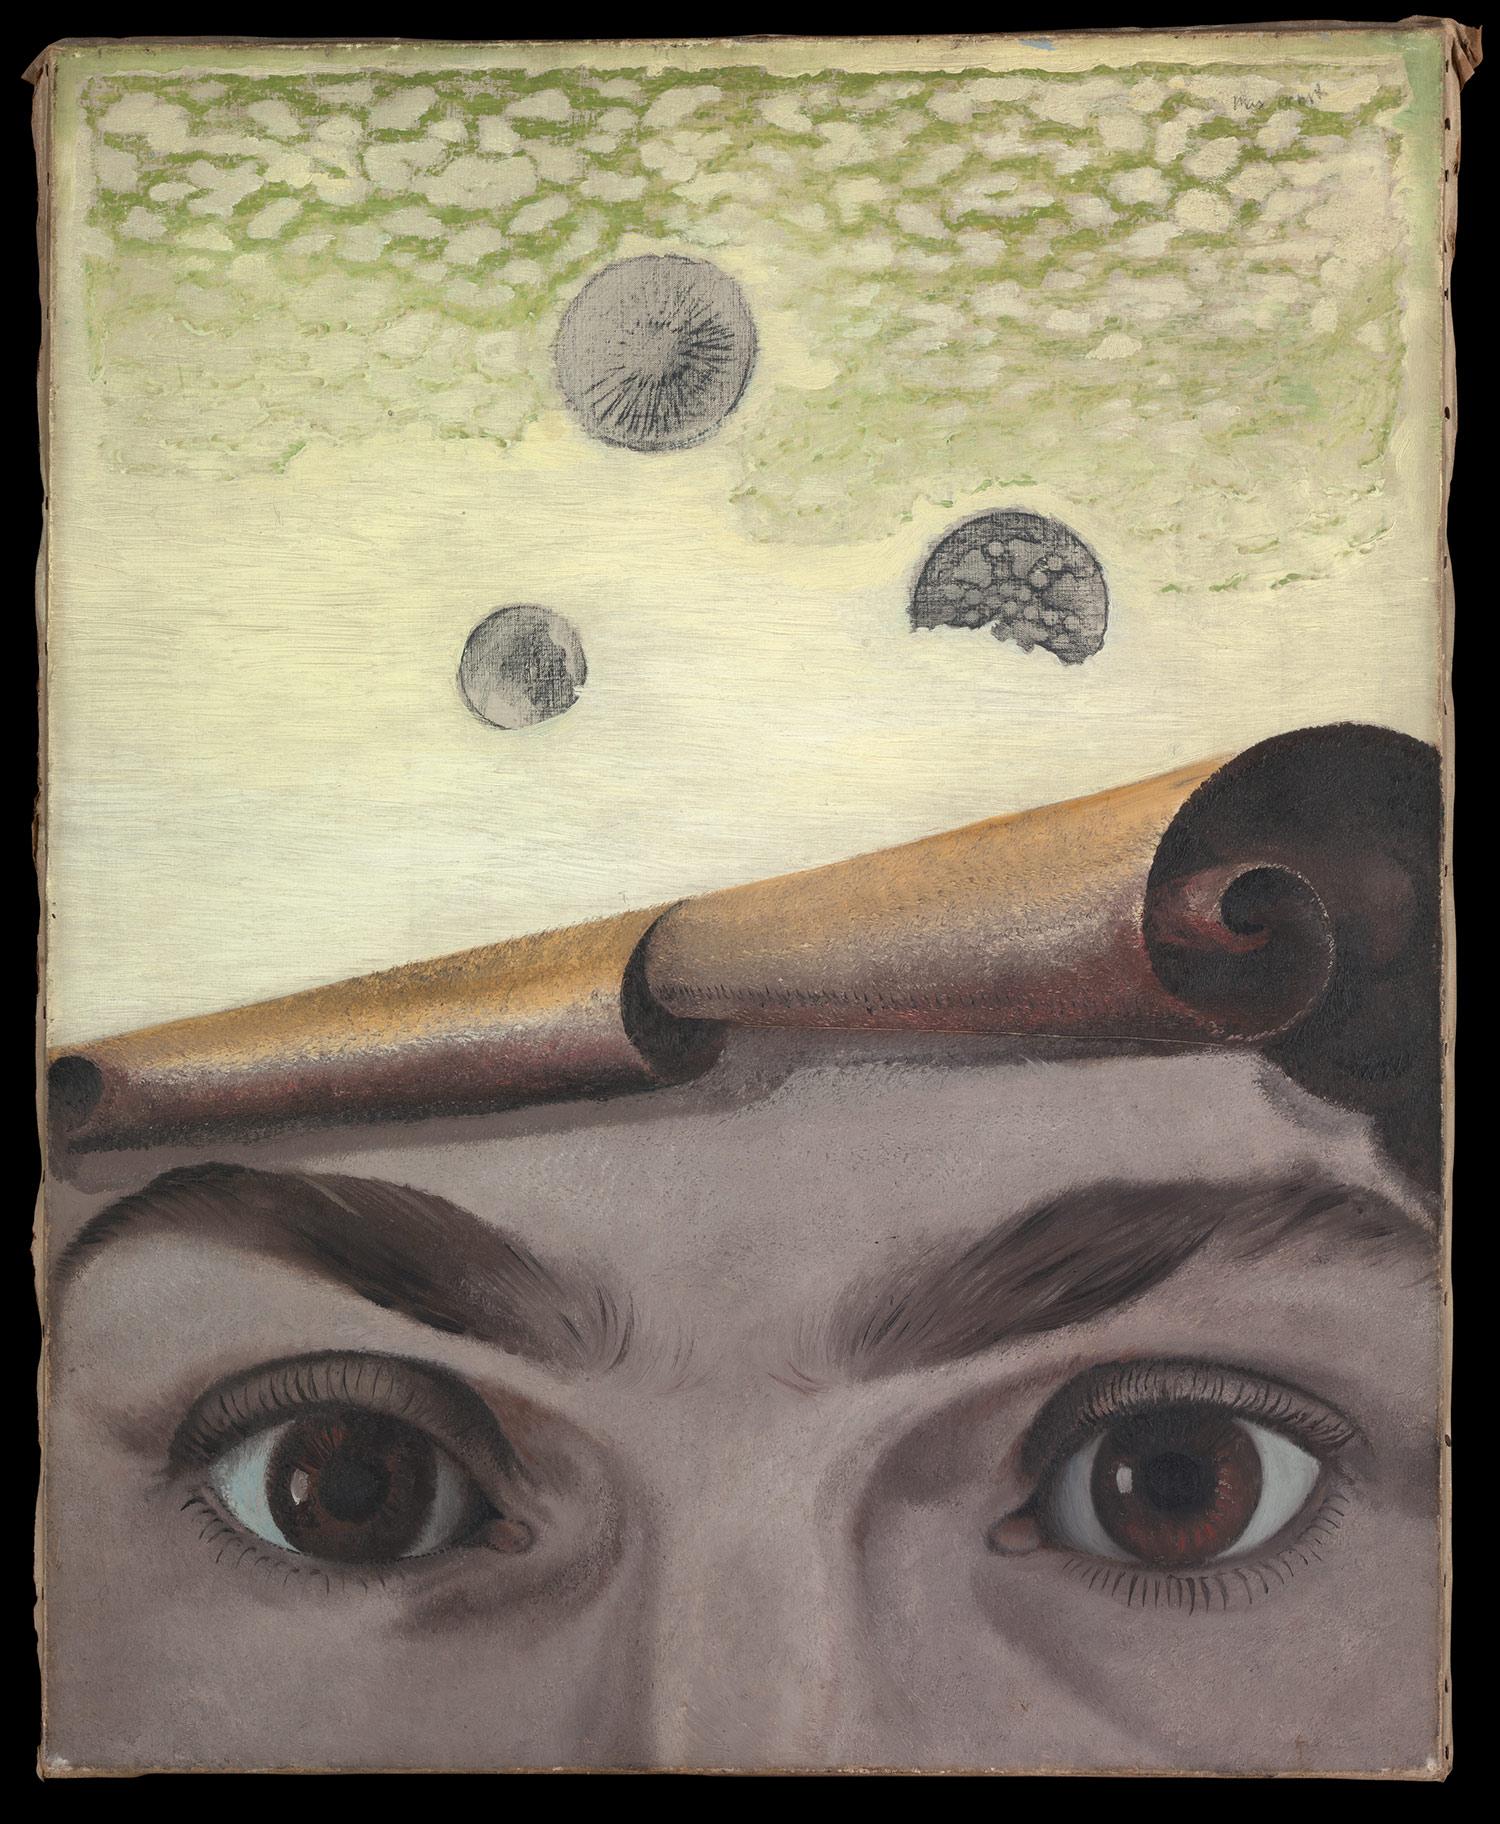 Surrealism thematic essay